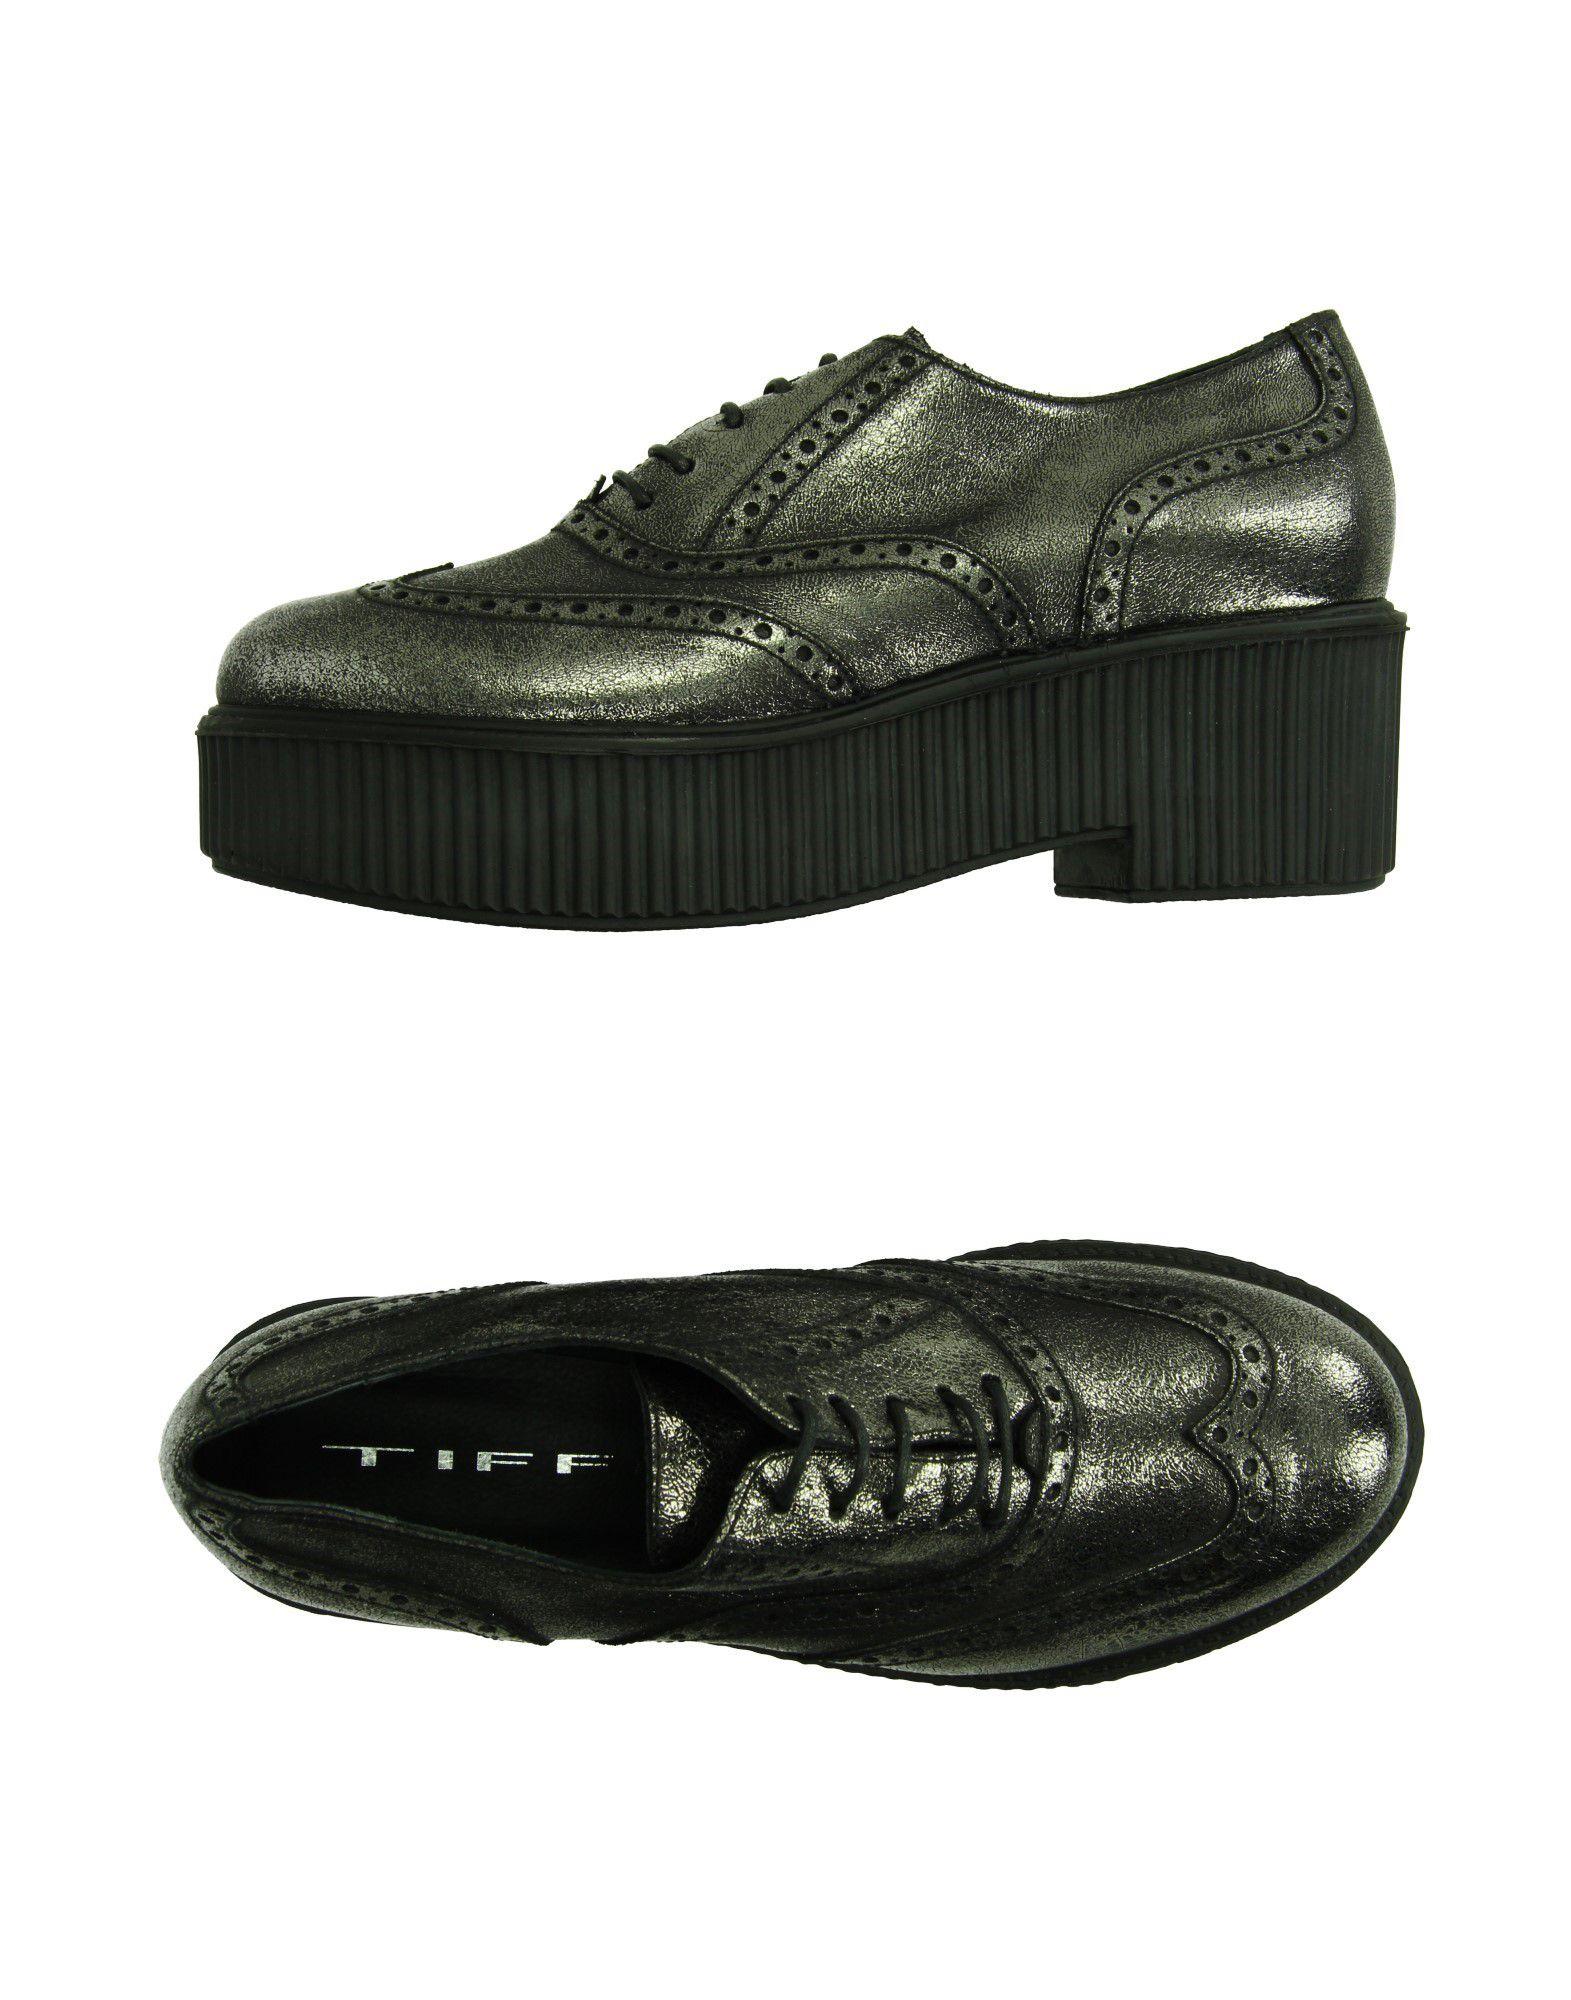 Tiffi Schnürschuhe Damen  11068504QI Gute Qualität beliebte Schuhe